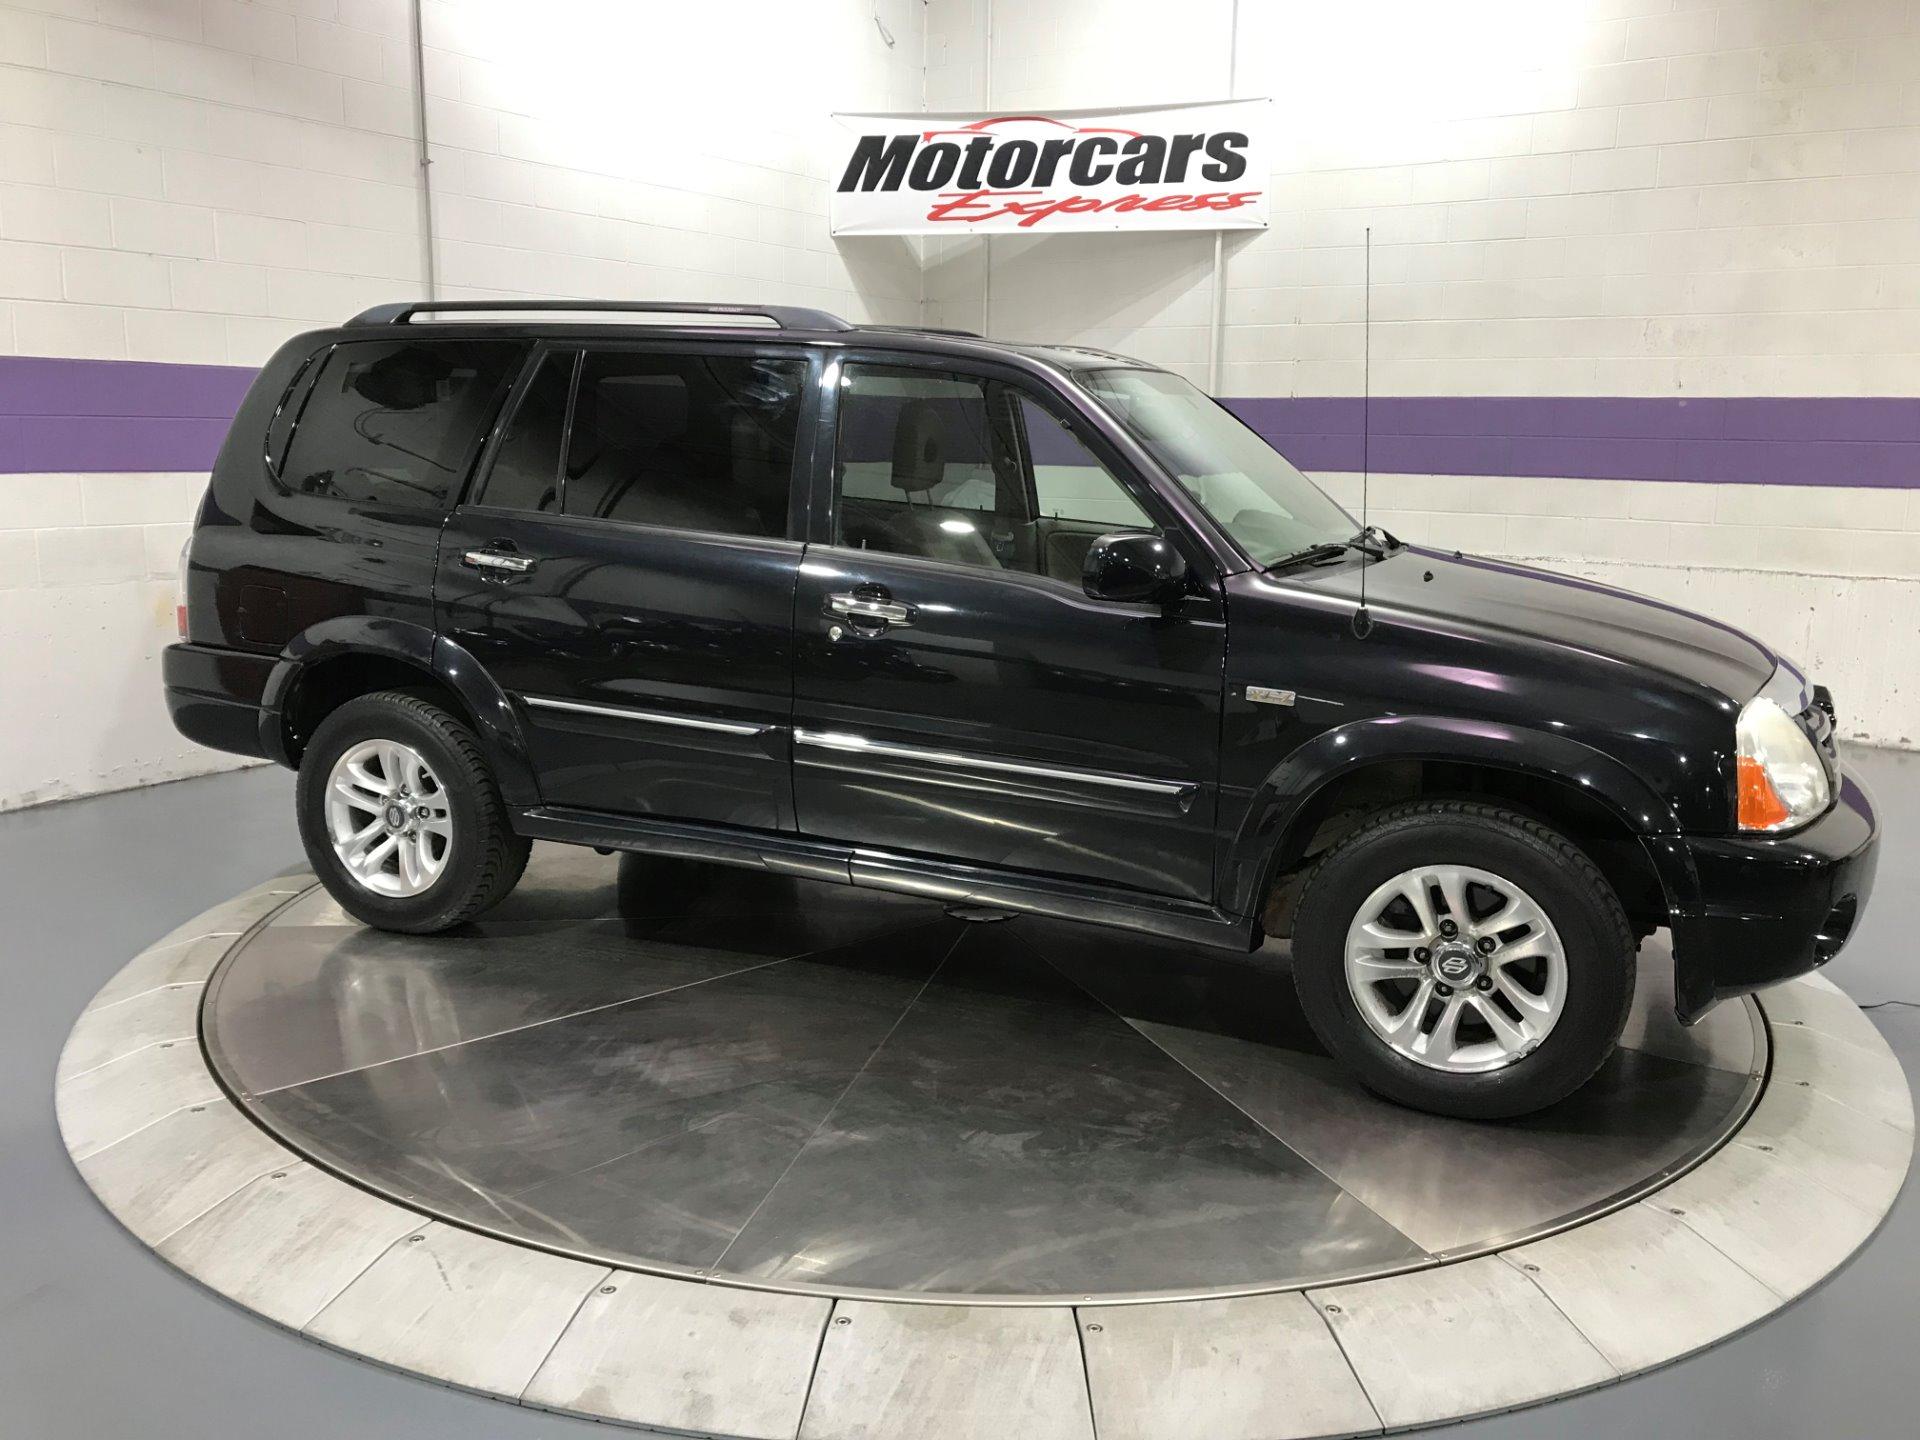 Used-2006-Suzuki-XL7-4X4-Premium